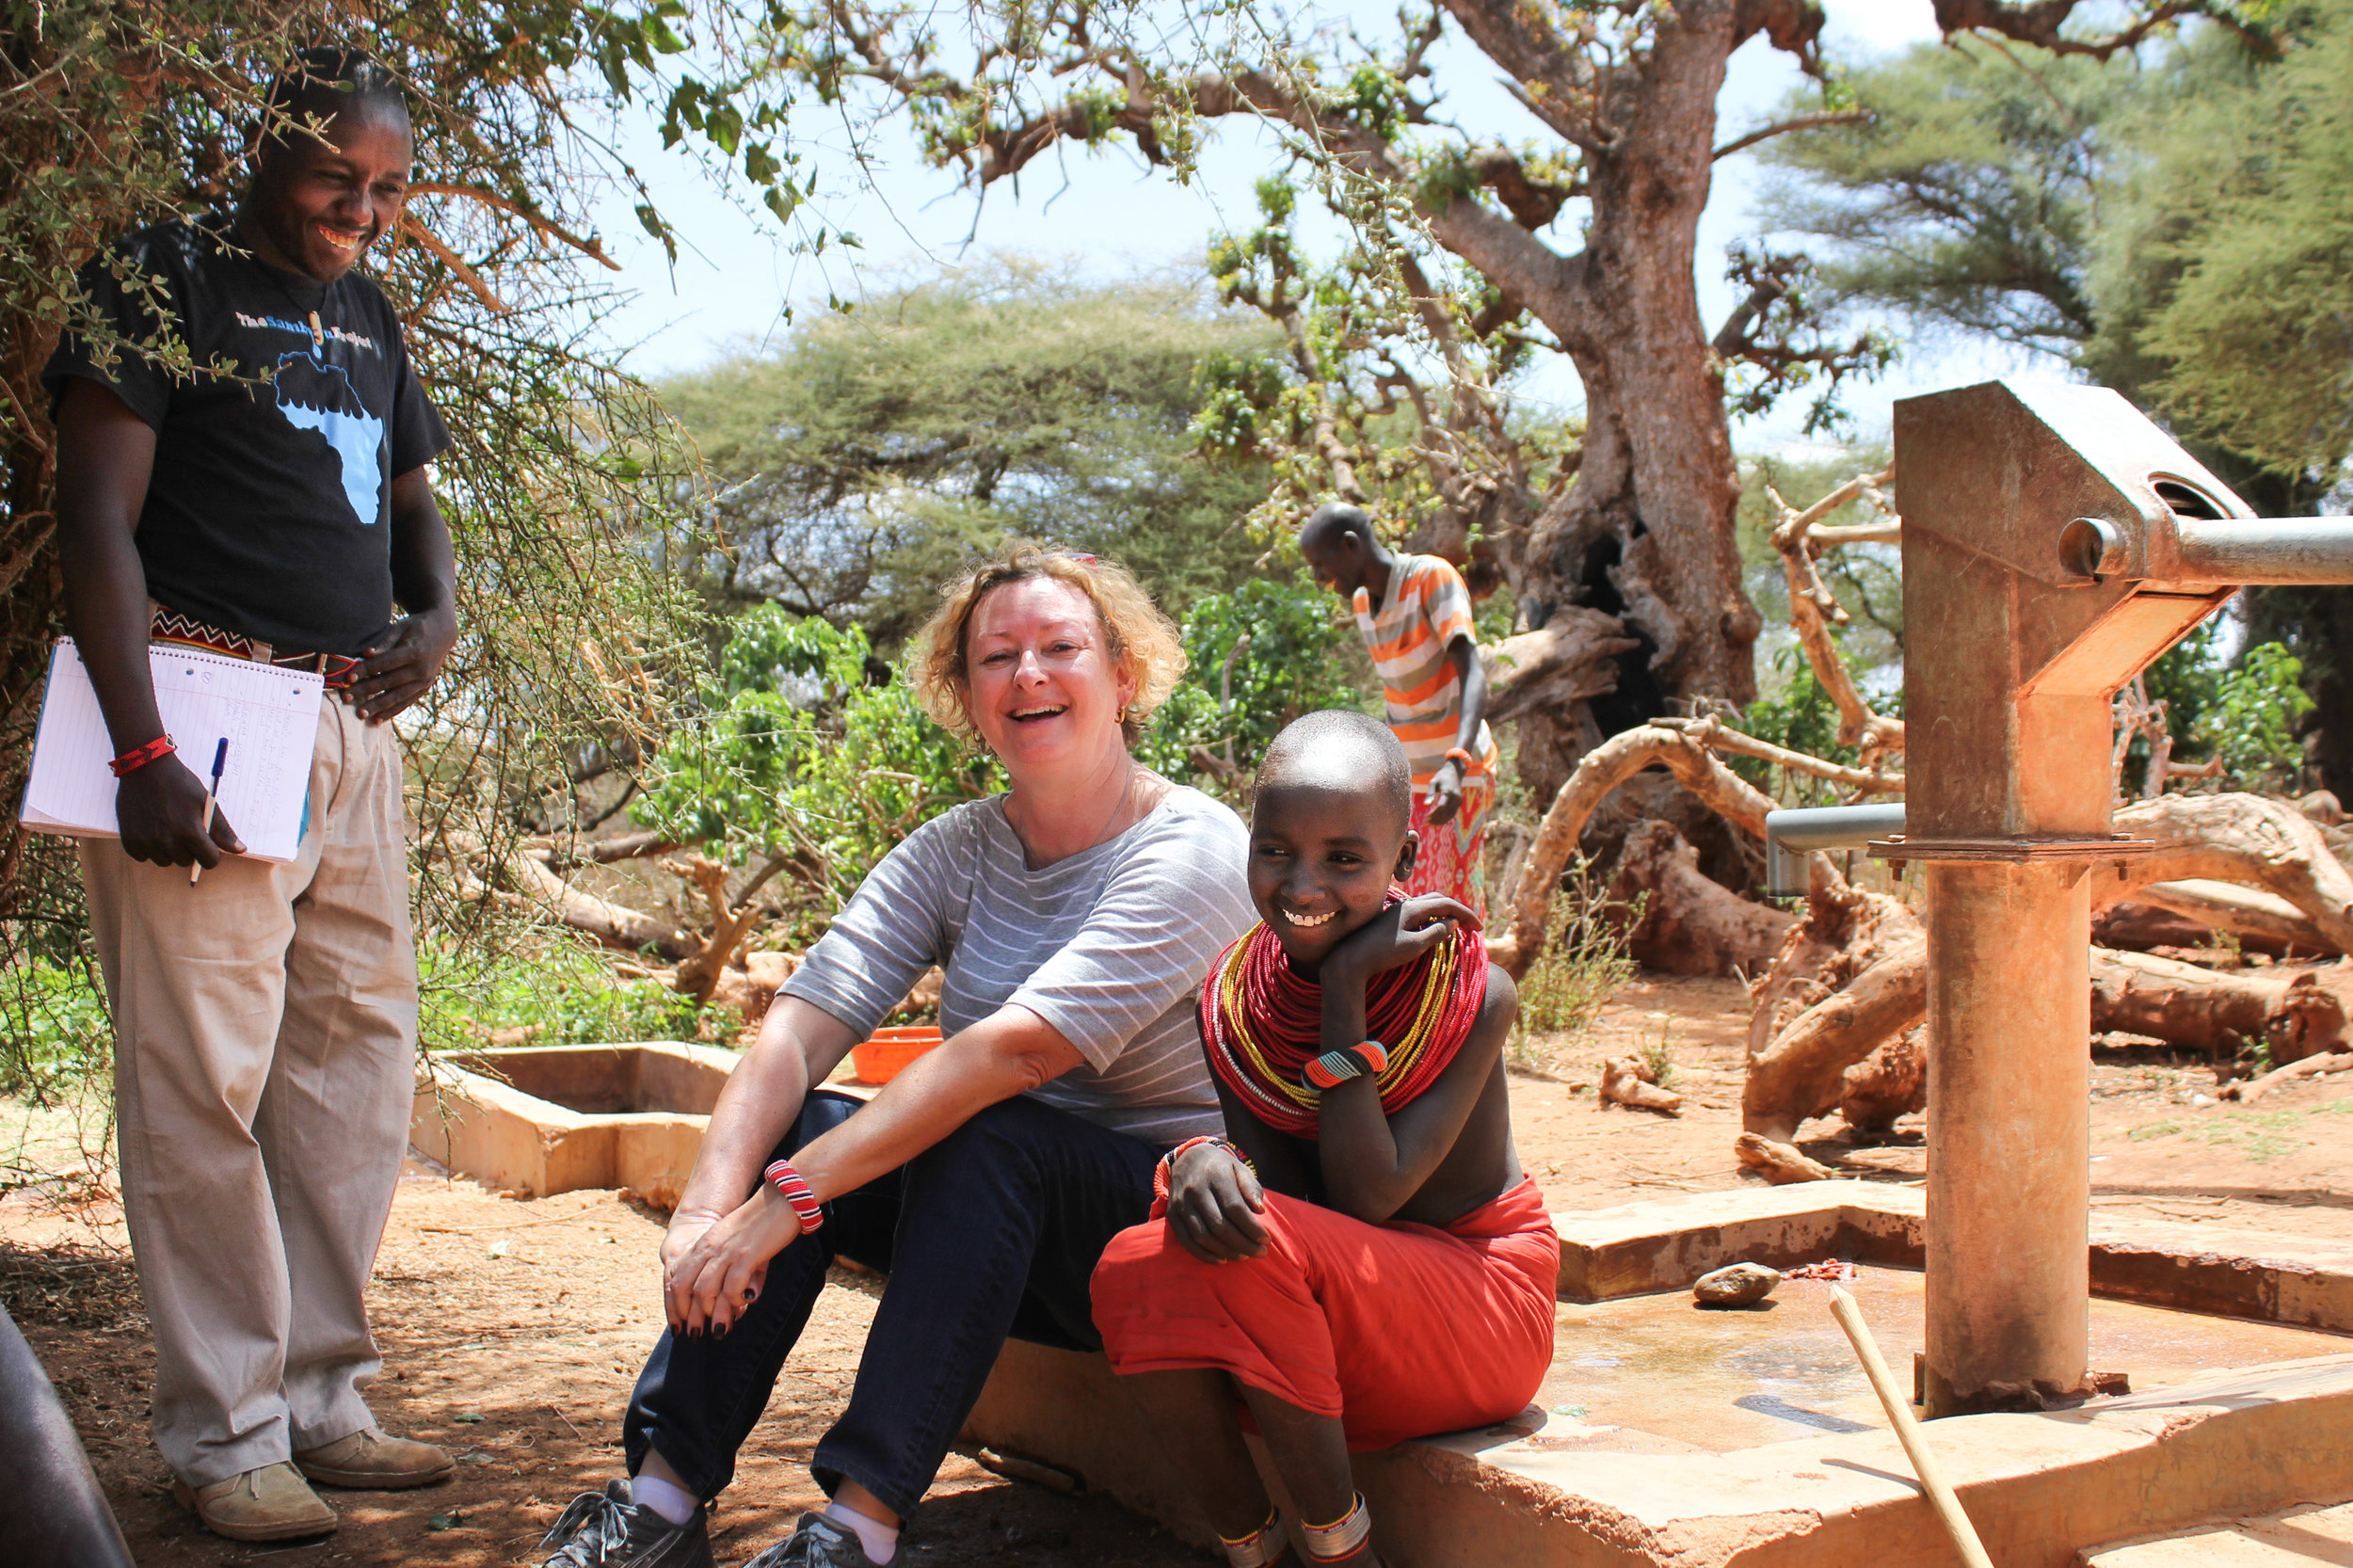 Linda Hooper, The Samburu Project Executive Director